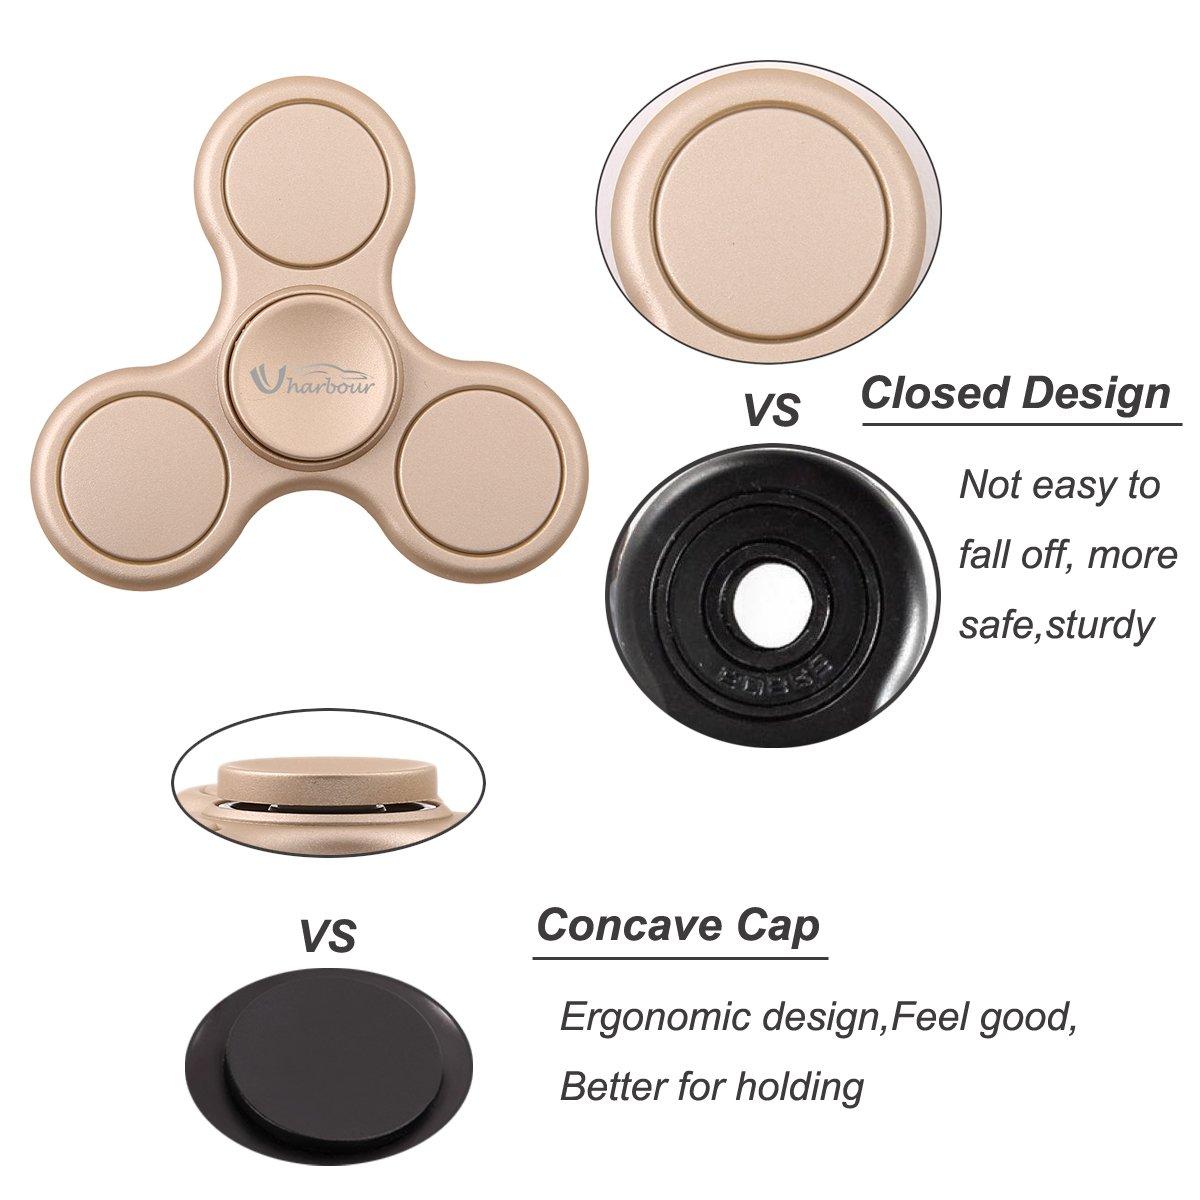 Mute Bearing for Kids Luxury Gold Uharbour ElitePro Prime Anti Stress Hand Toy Fidget Tri-Spinner